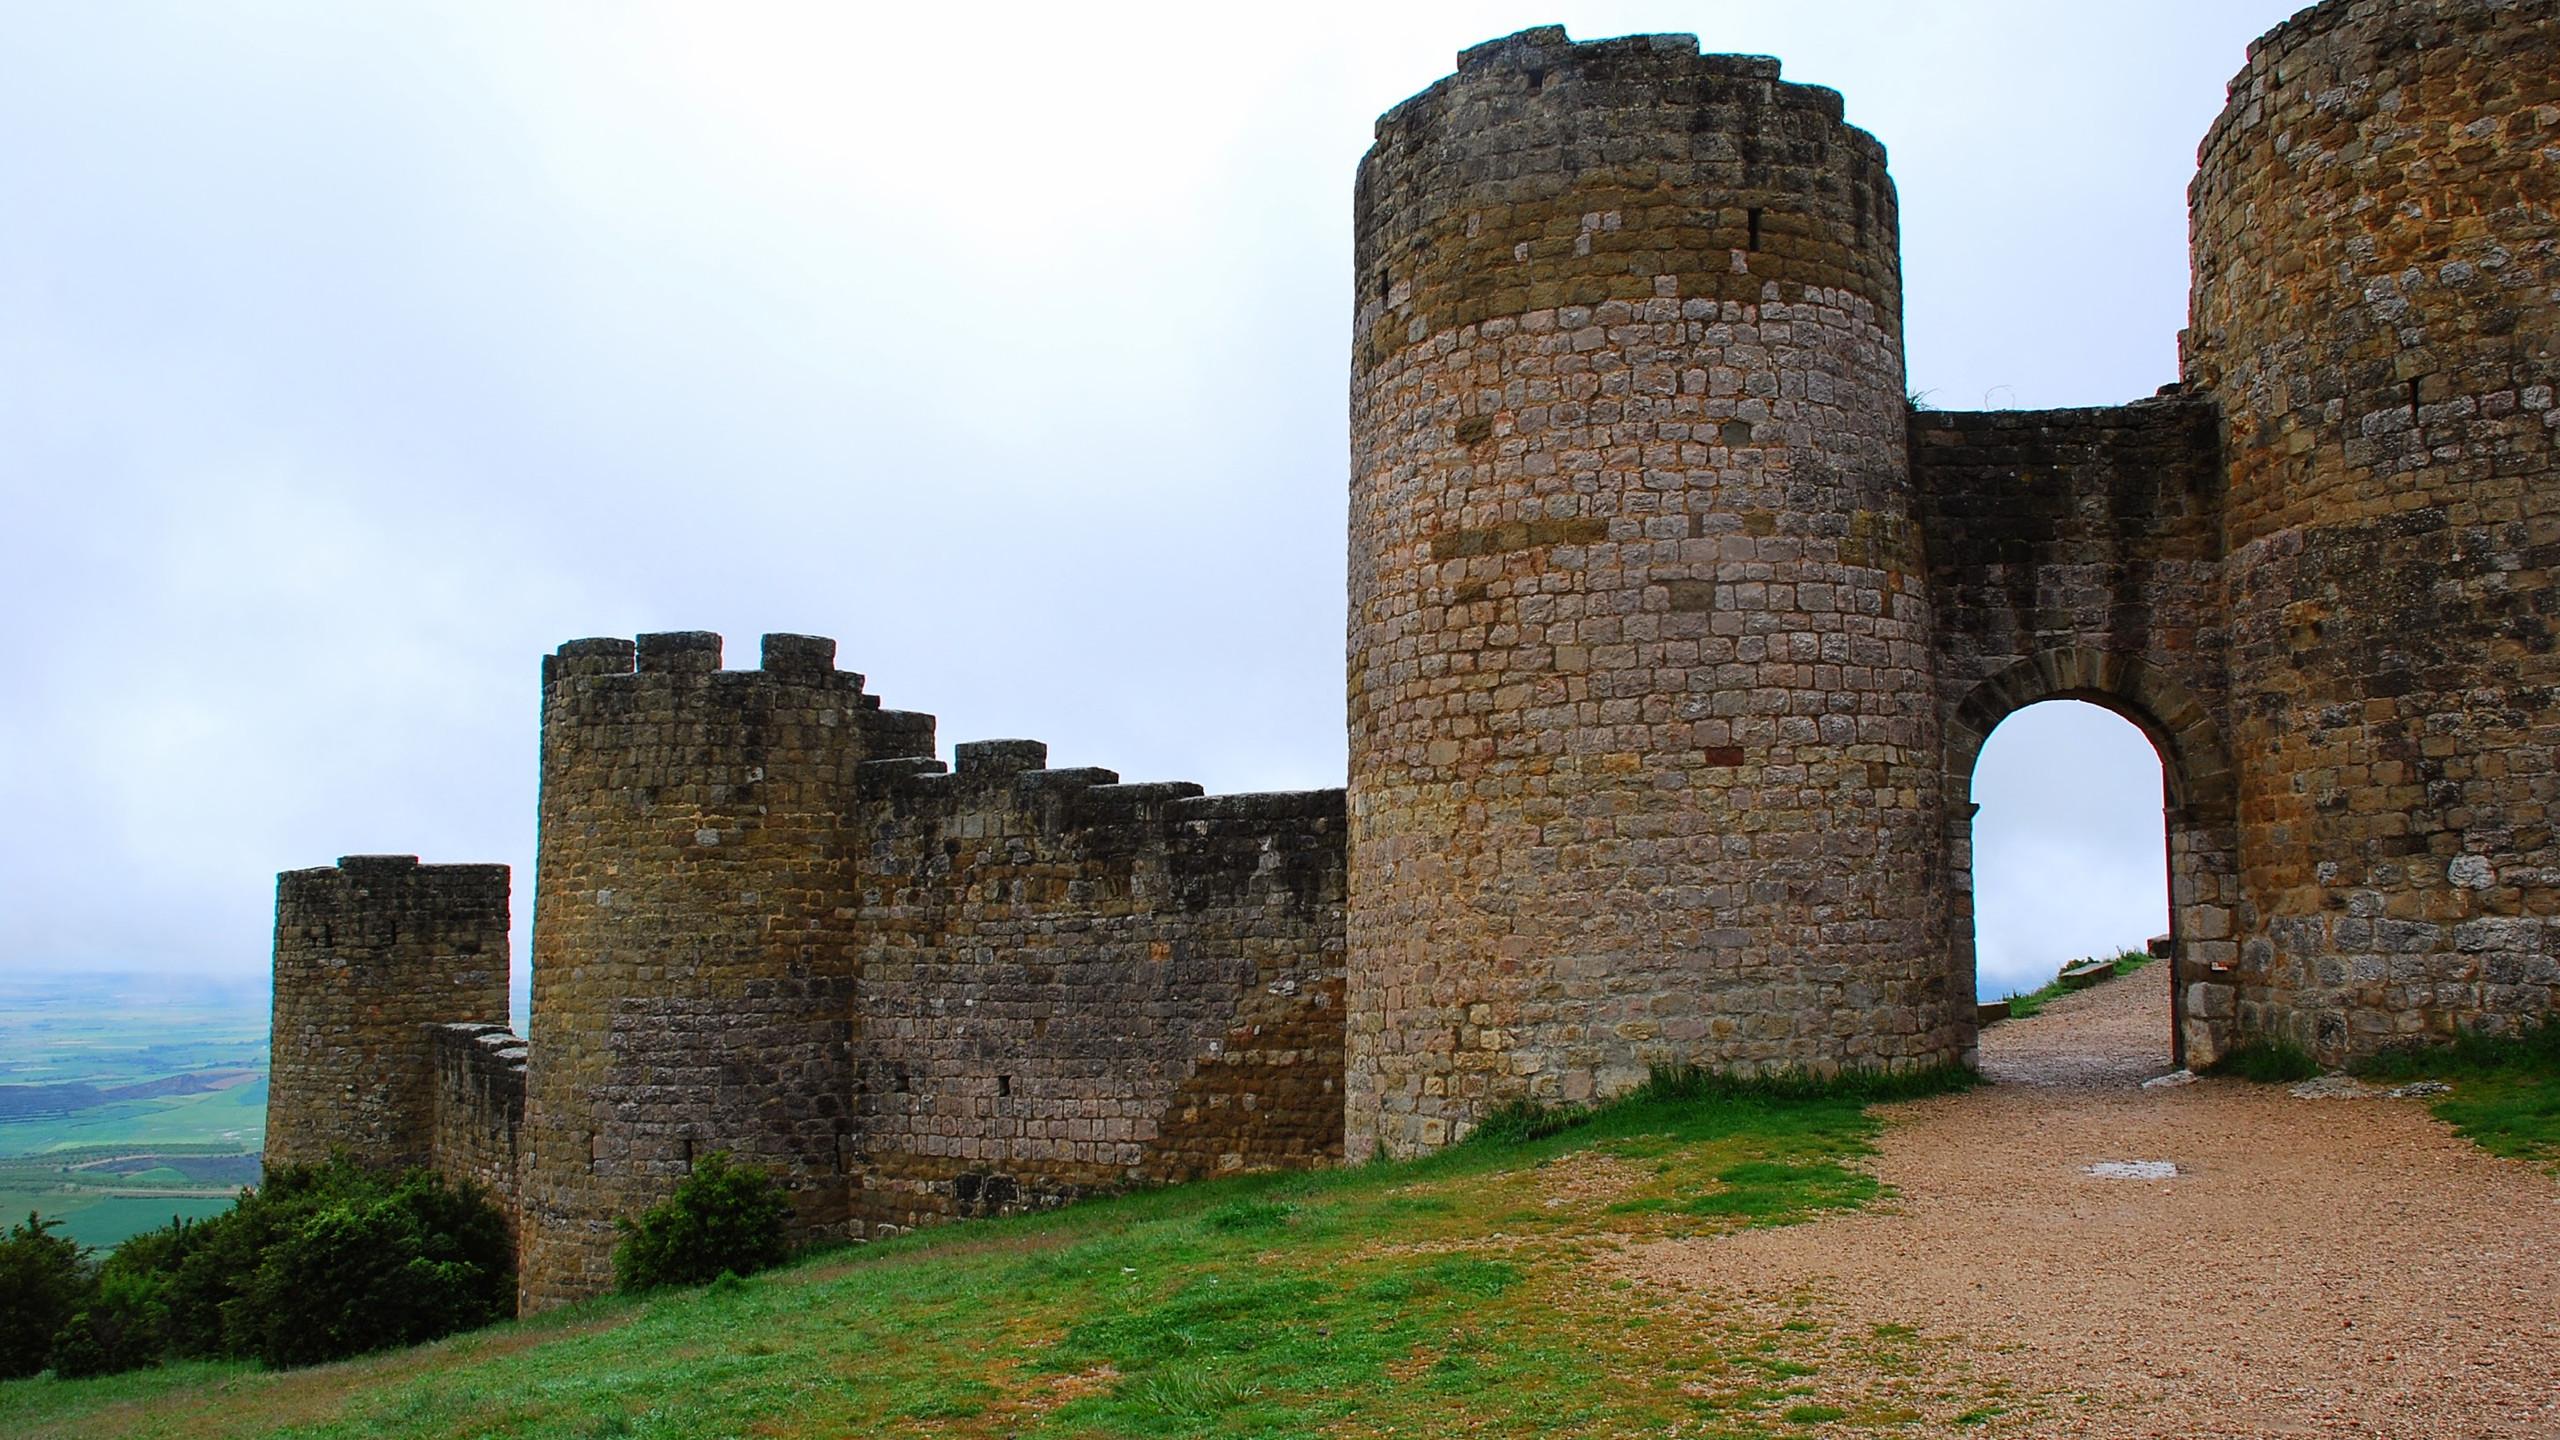 Castillo de Loarre - 14